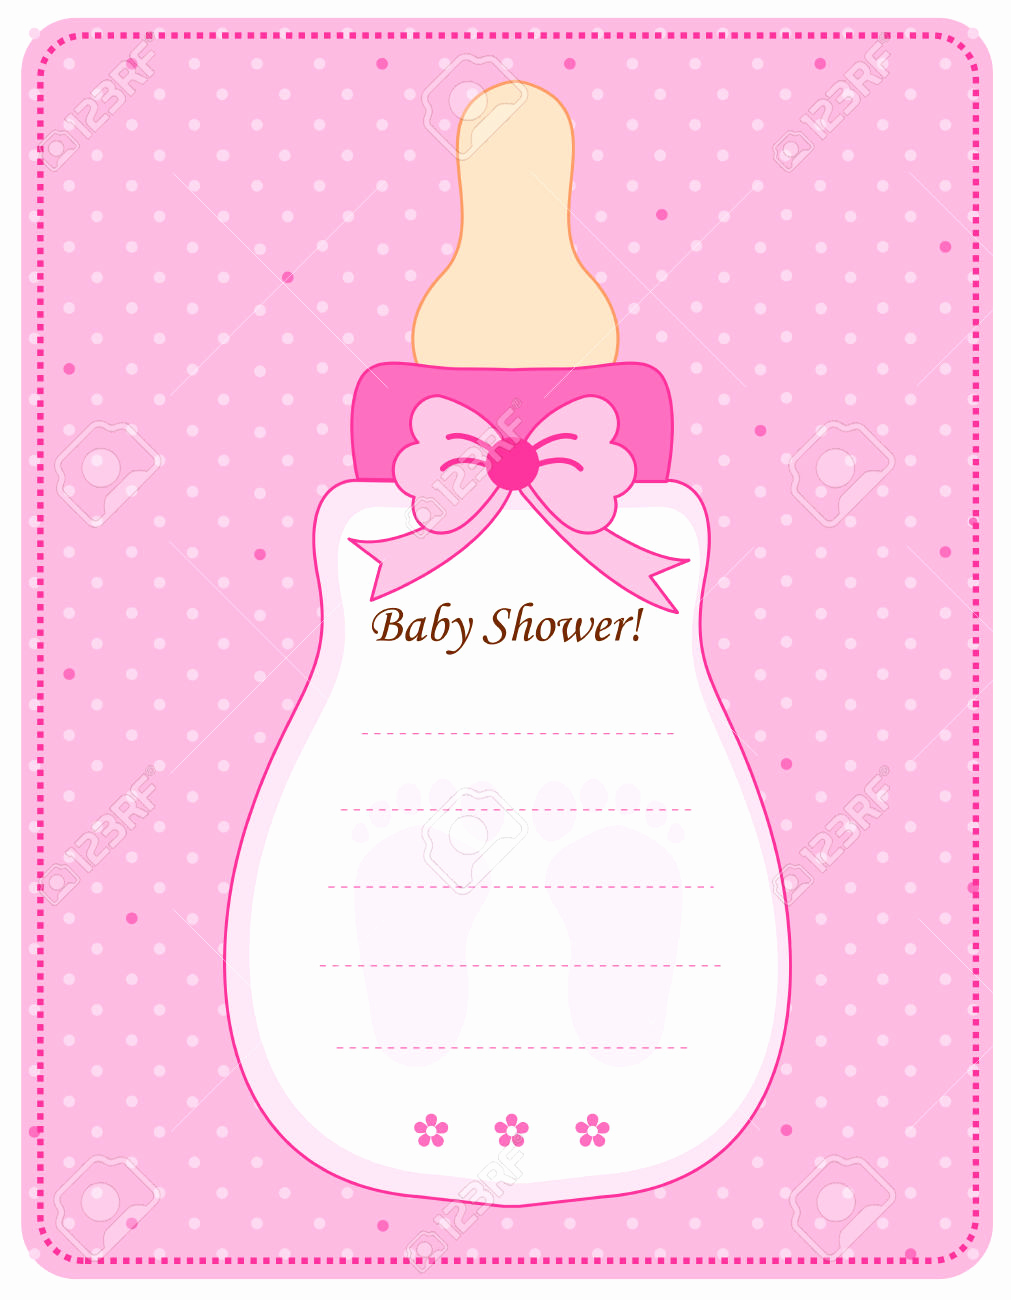 Baby Shower Invitation for Girls Lovely Baby Girl Invitation Templates